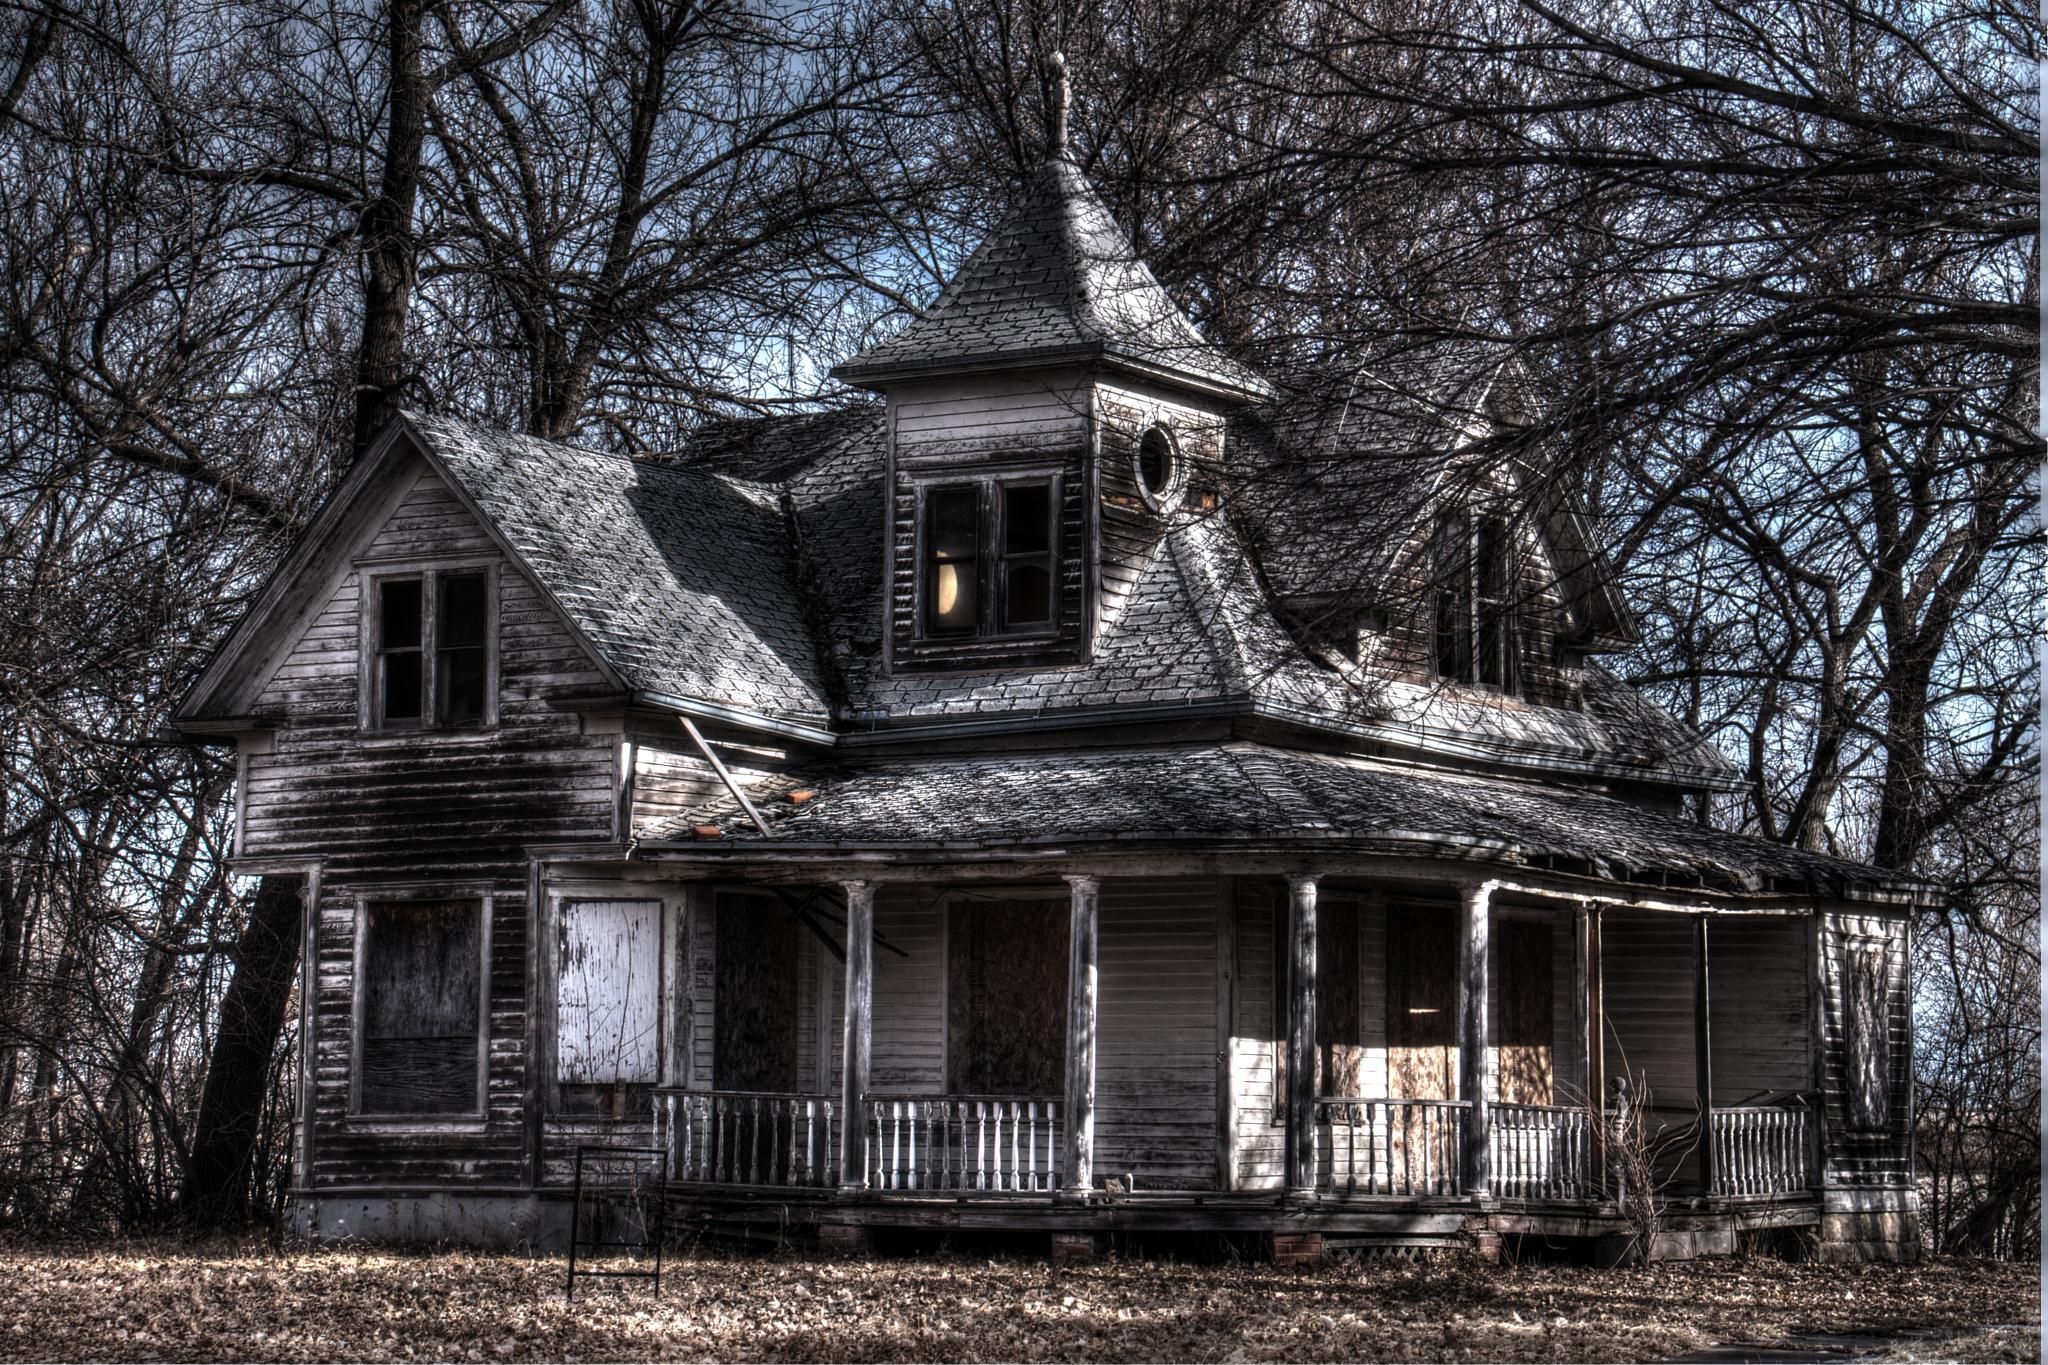 Haunted House by JulieHalloran